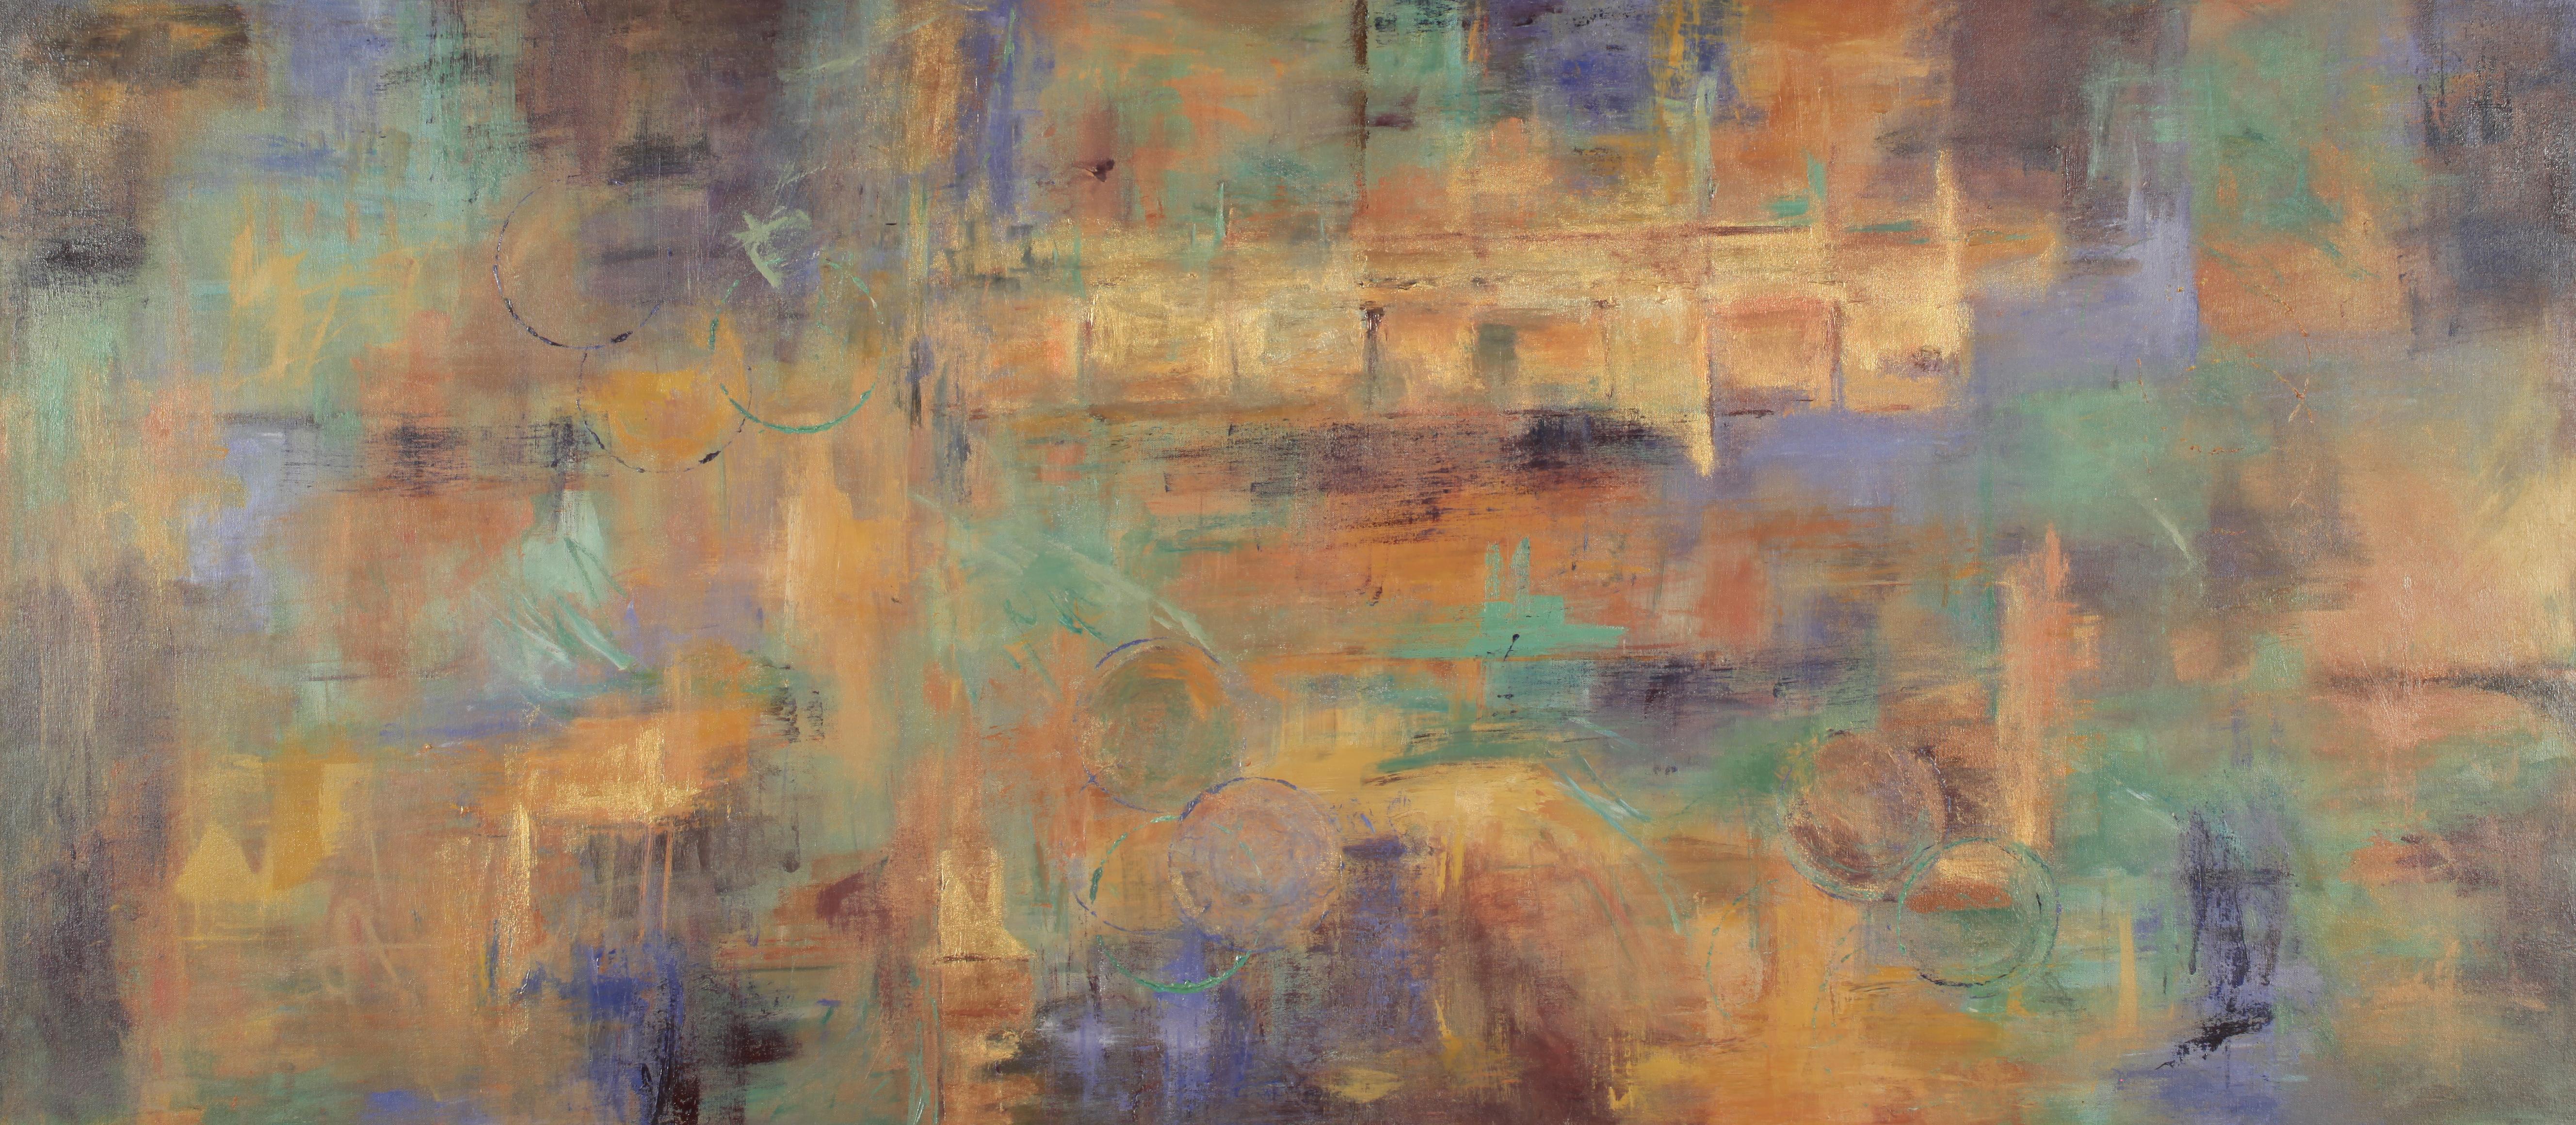 movement-through-color-iii